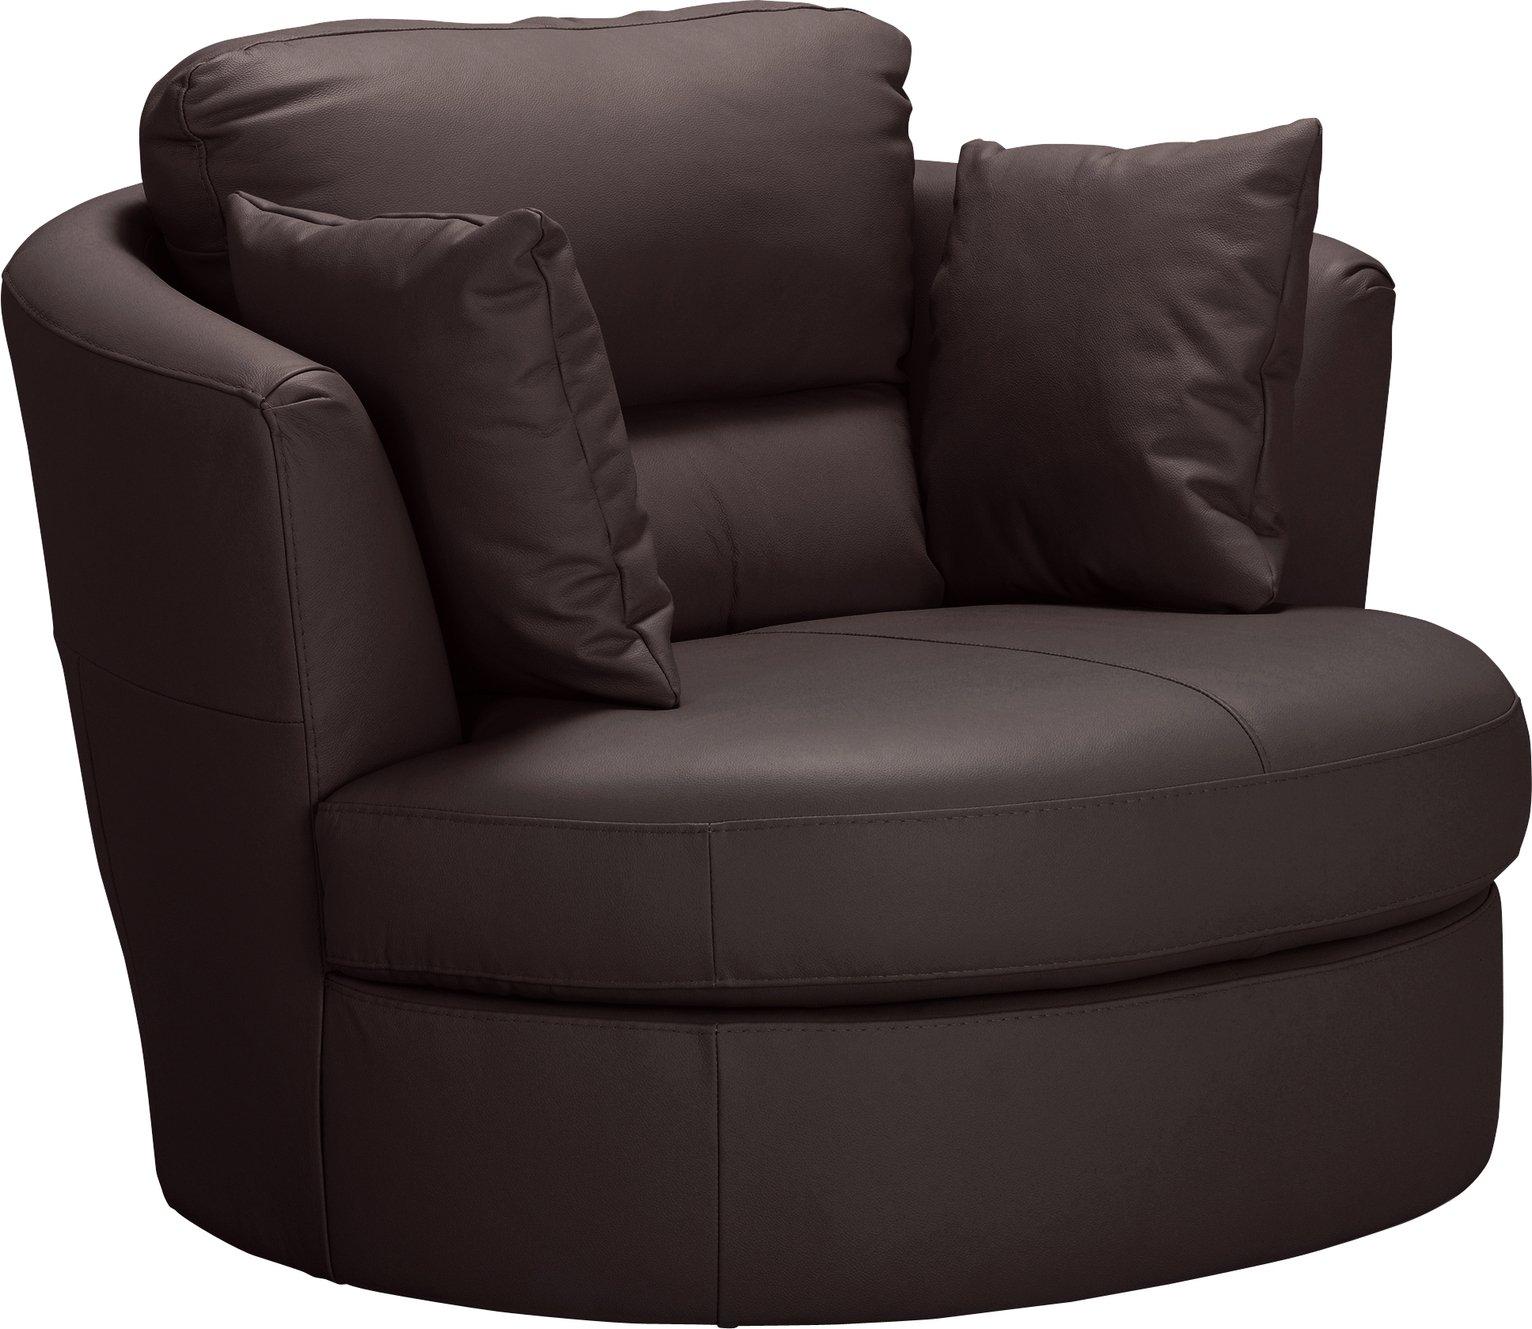 Argos Home Trieste Leather Swivel Chair - Dark Brown